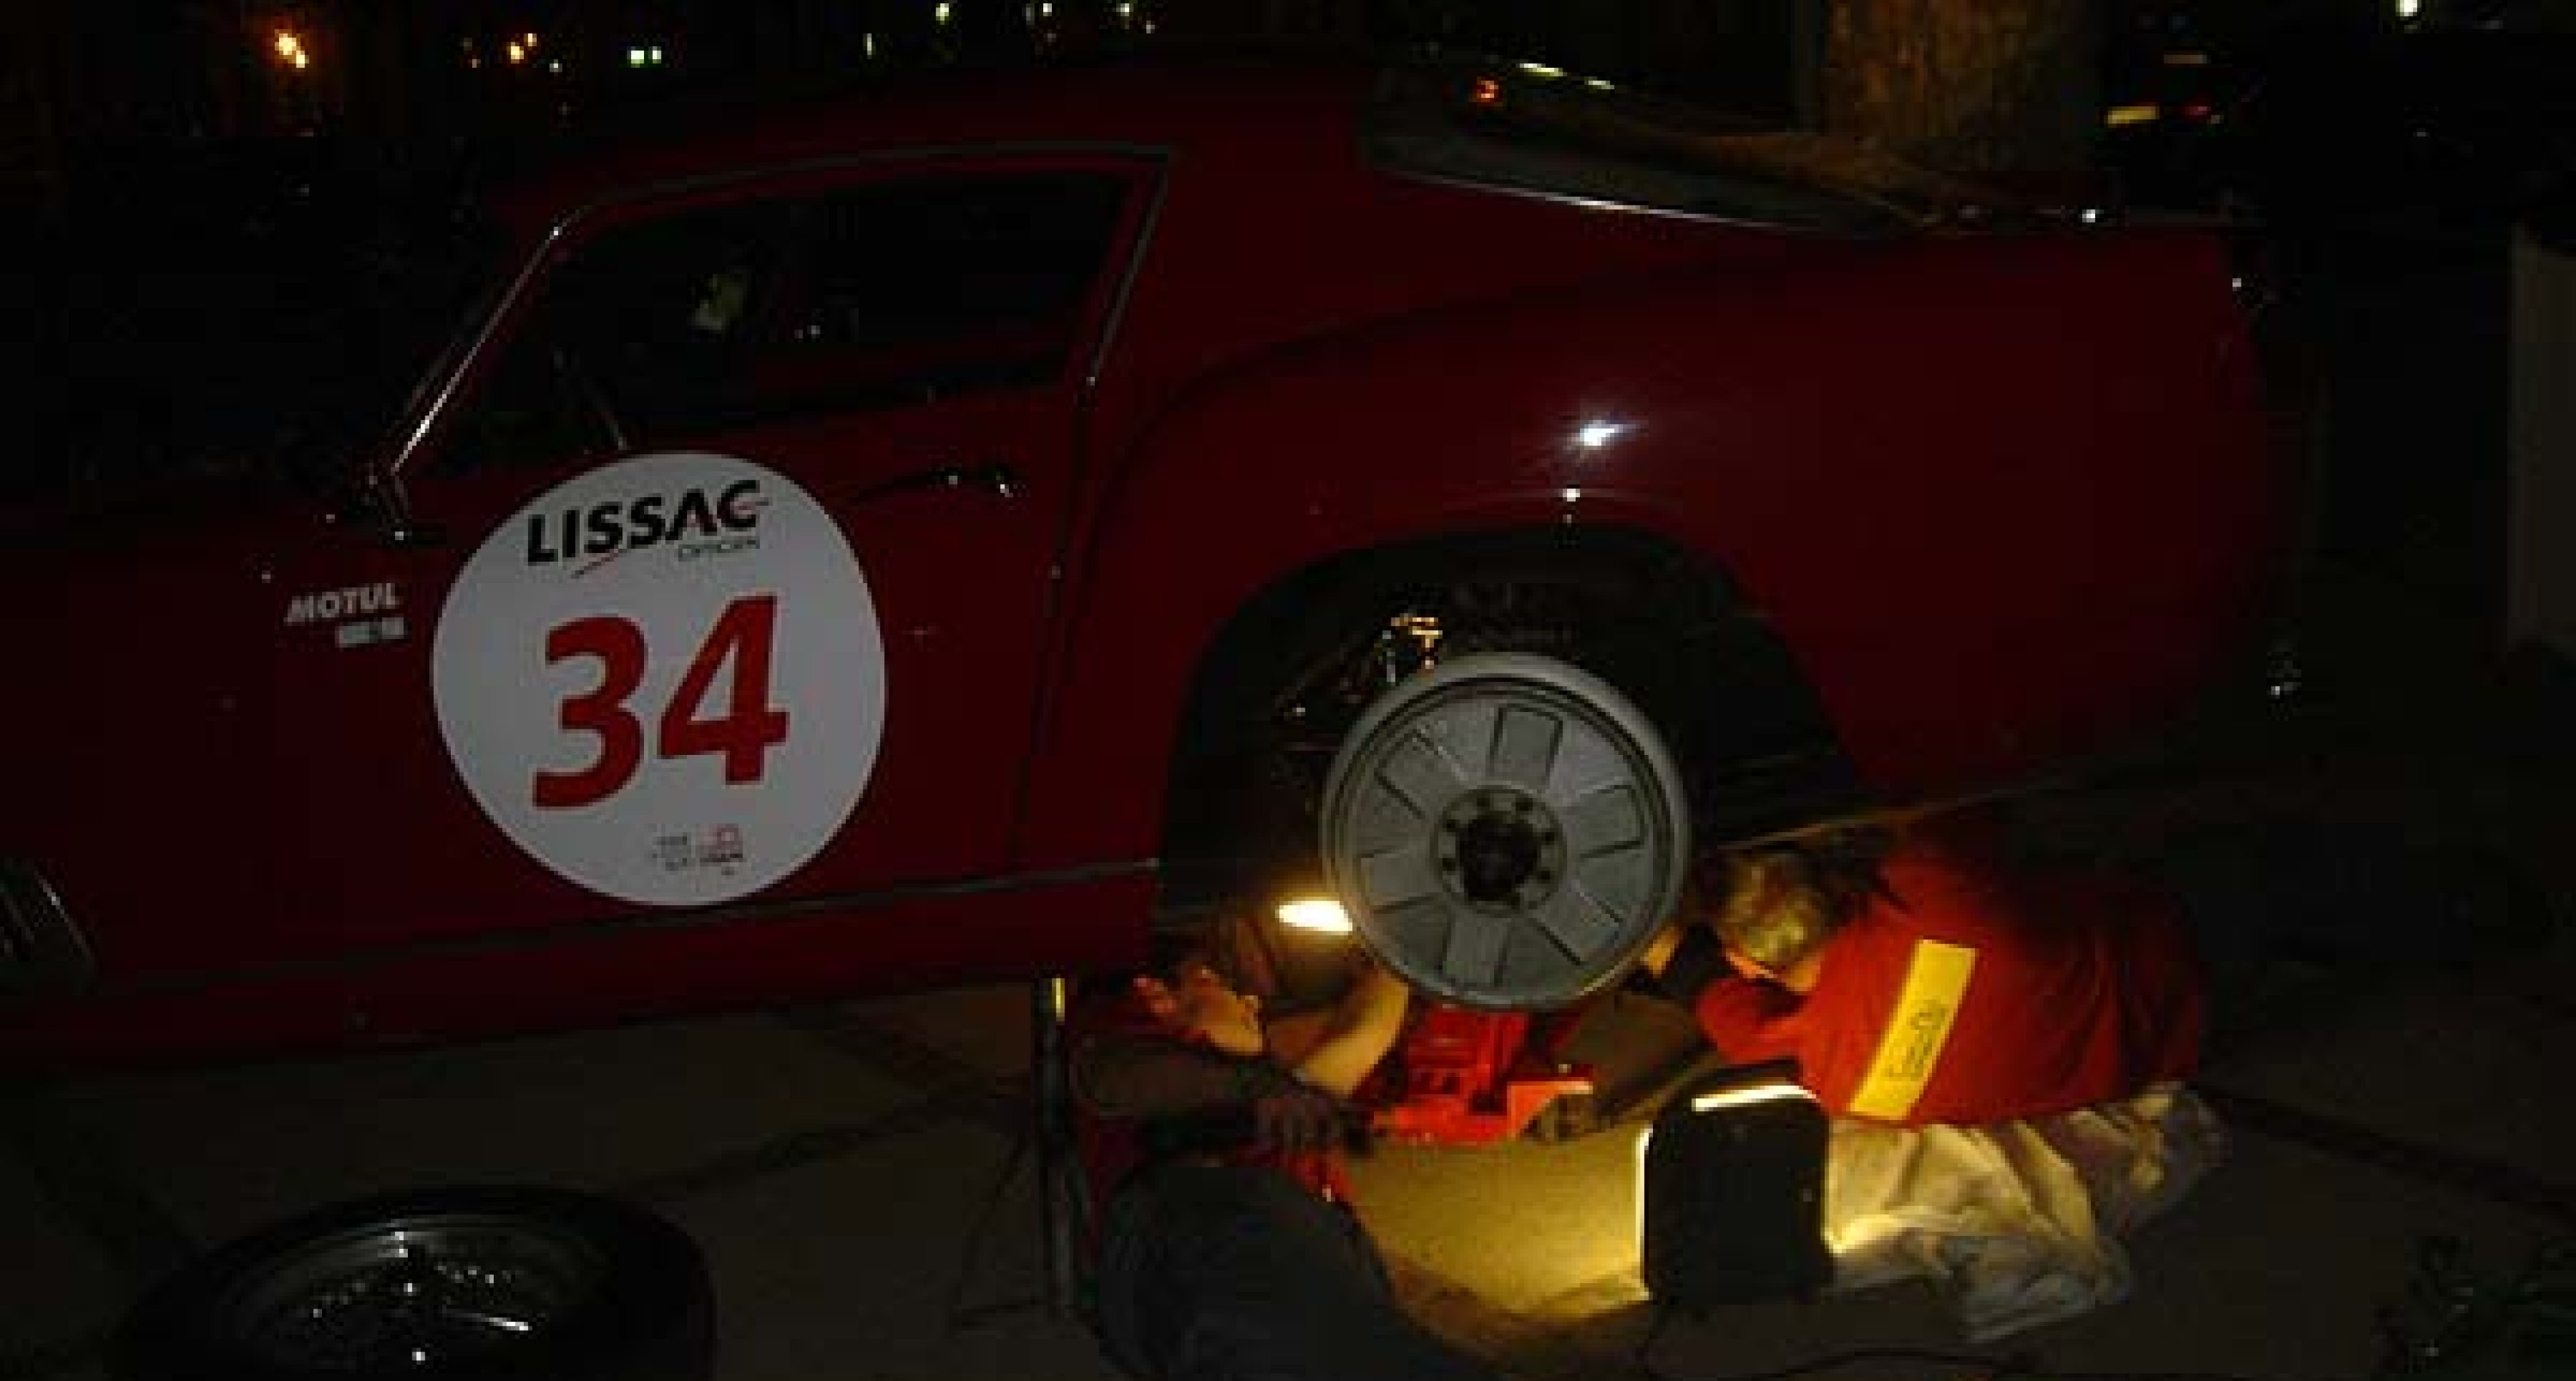 Tour Auto 2005 - Final Reckoning